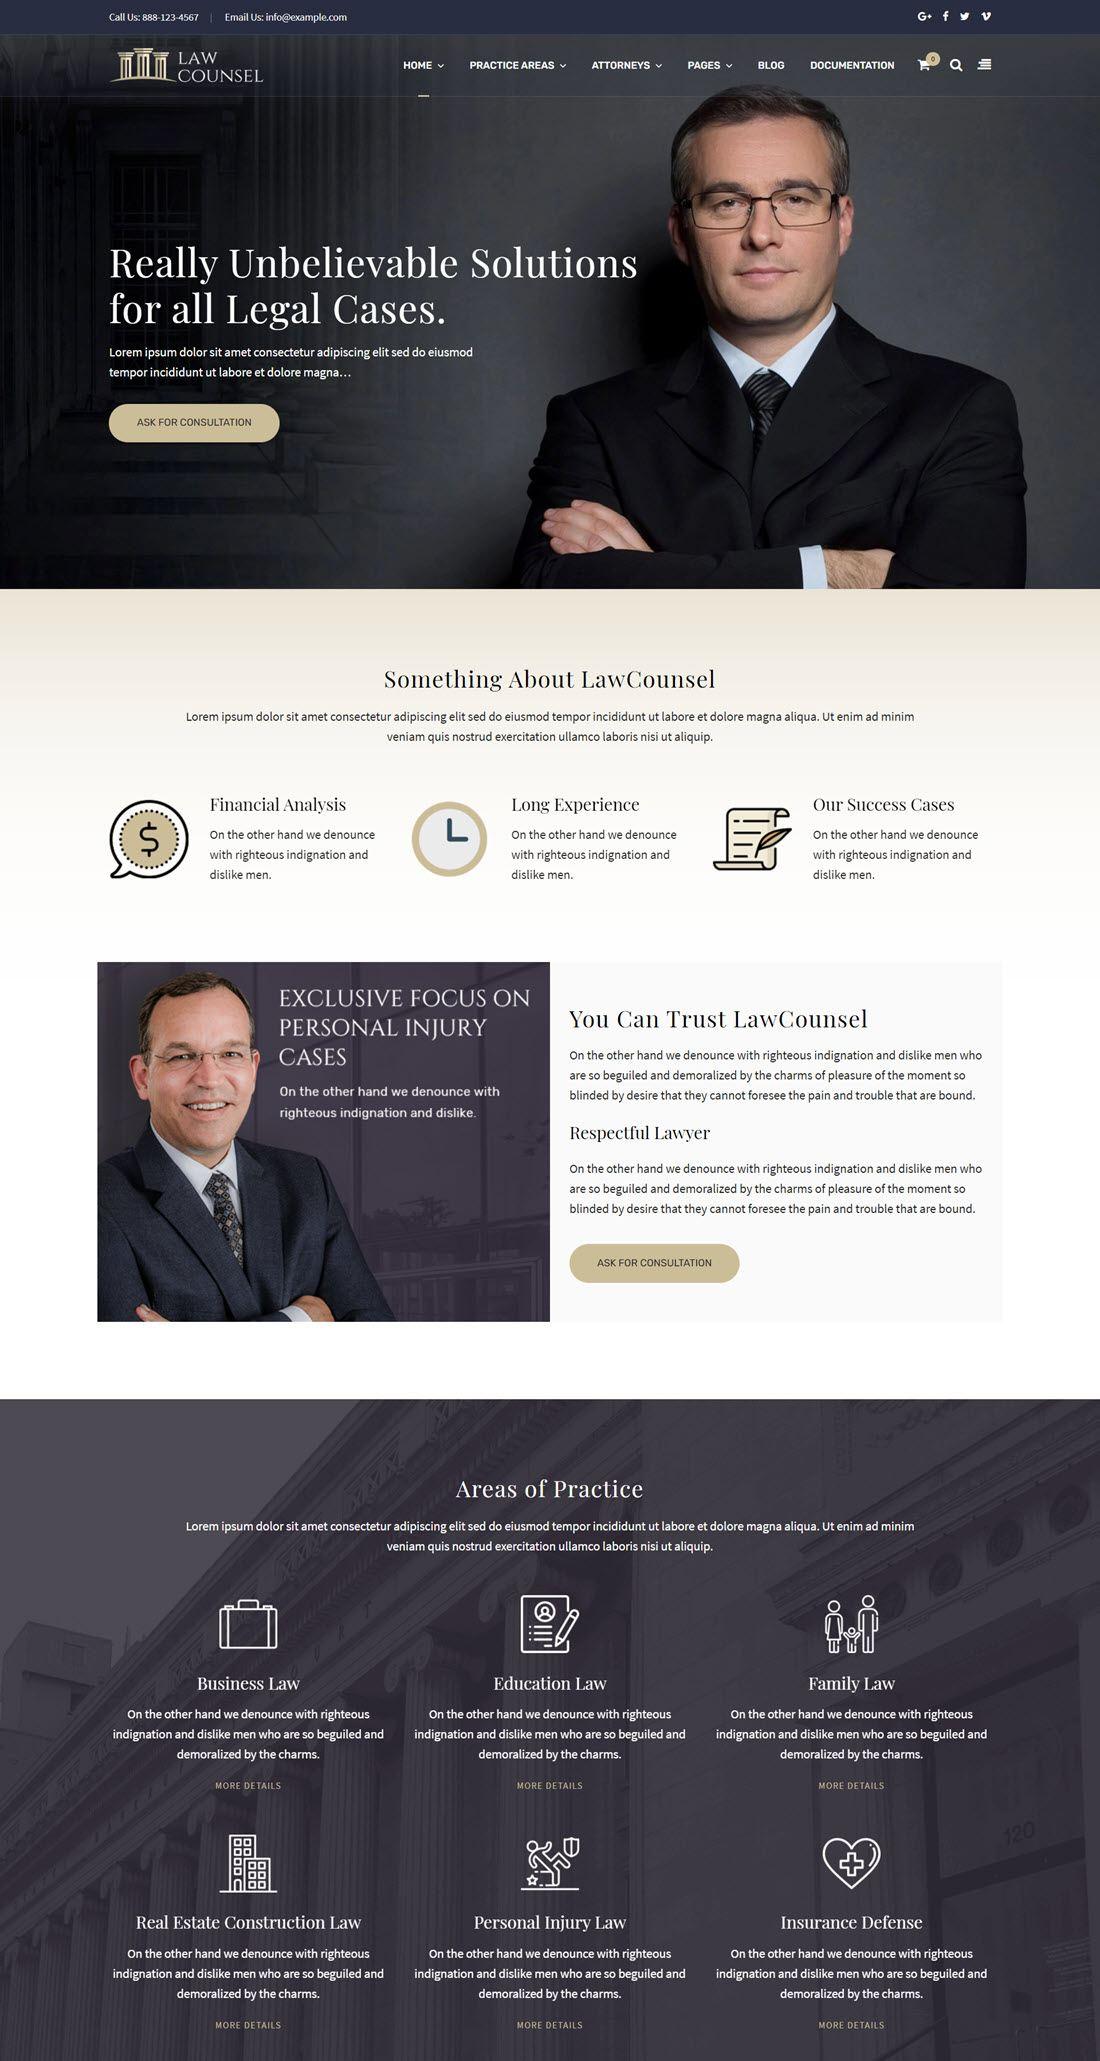 LawCounsel Lawyers WordPress Theme Screenshot